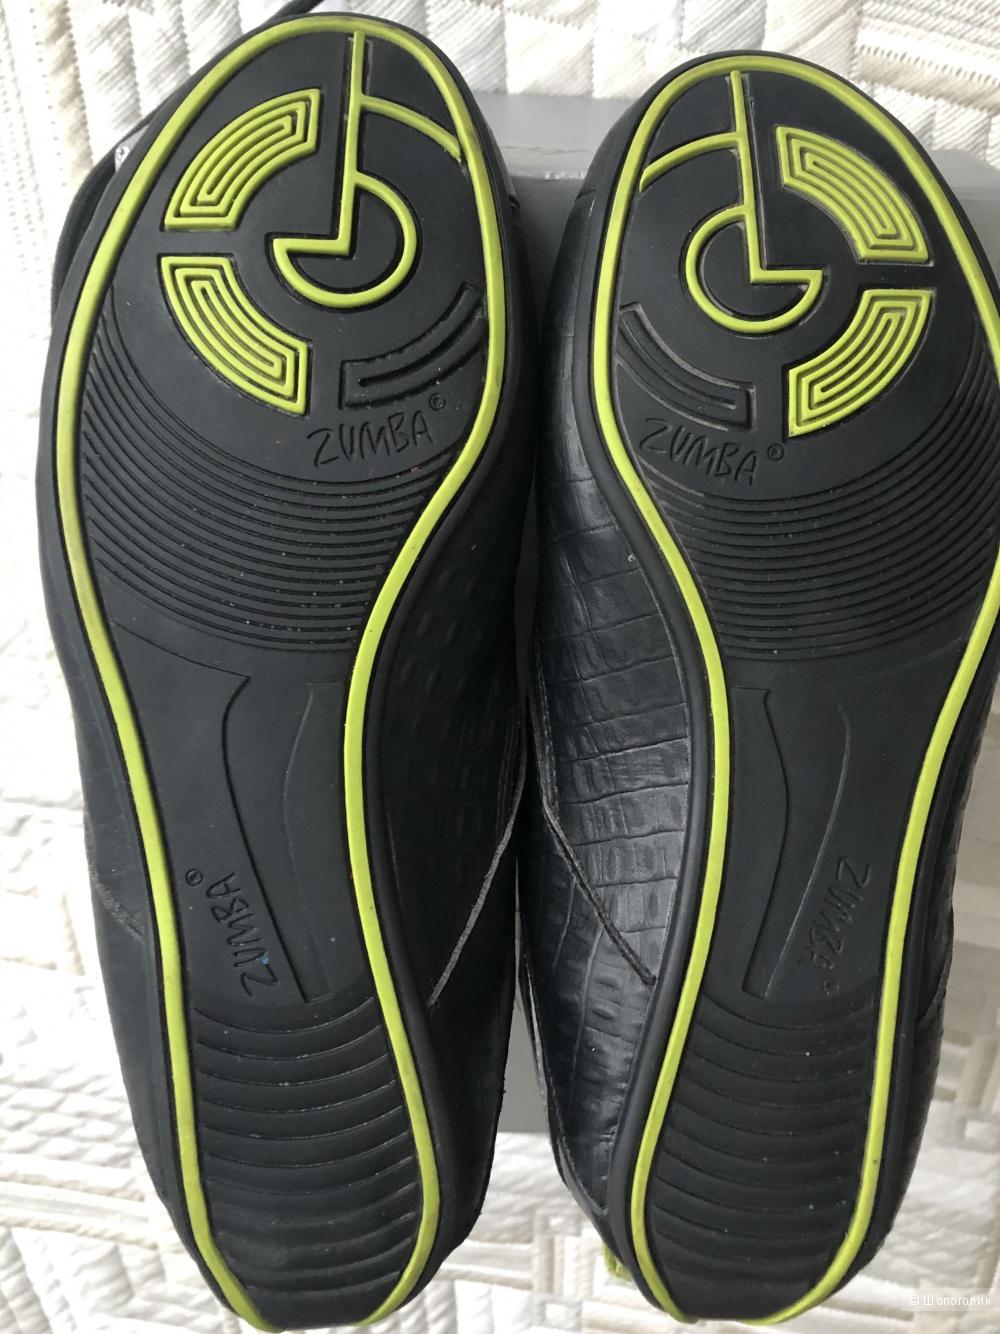 Кроссовки Zumba размер 37